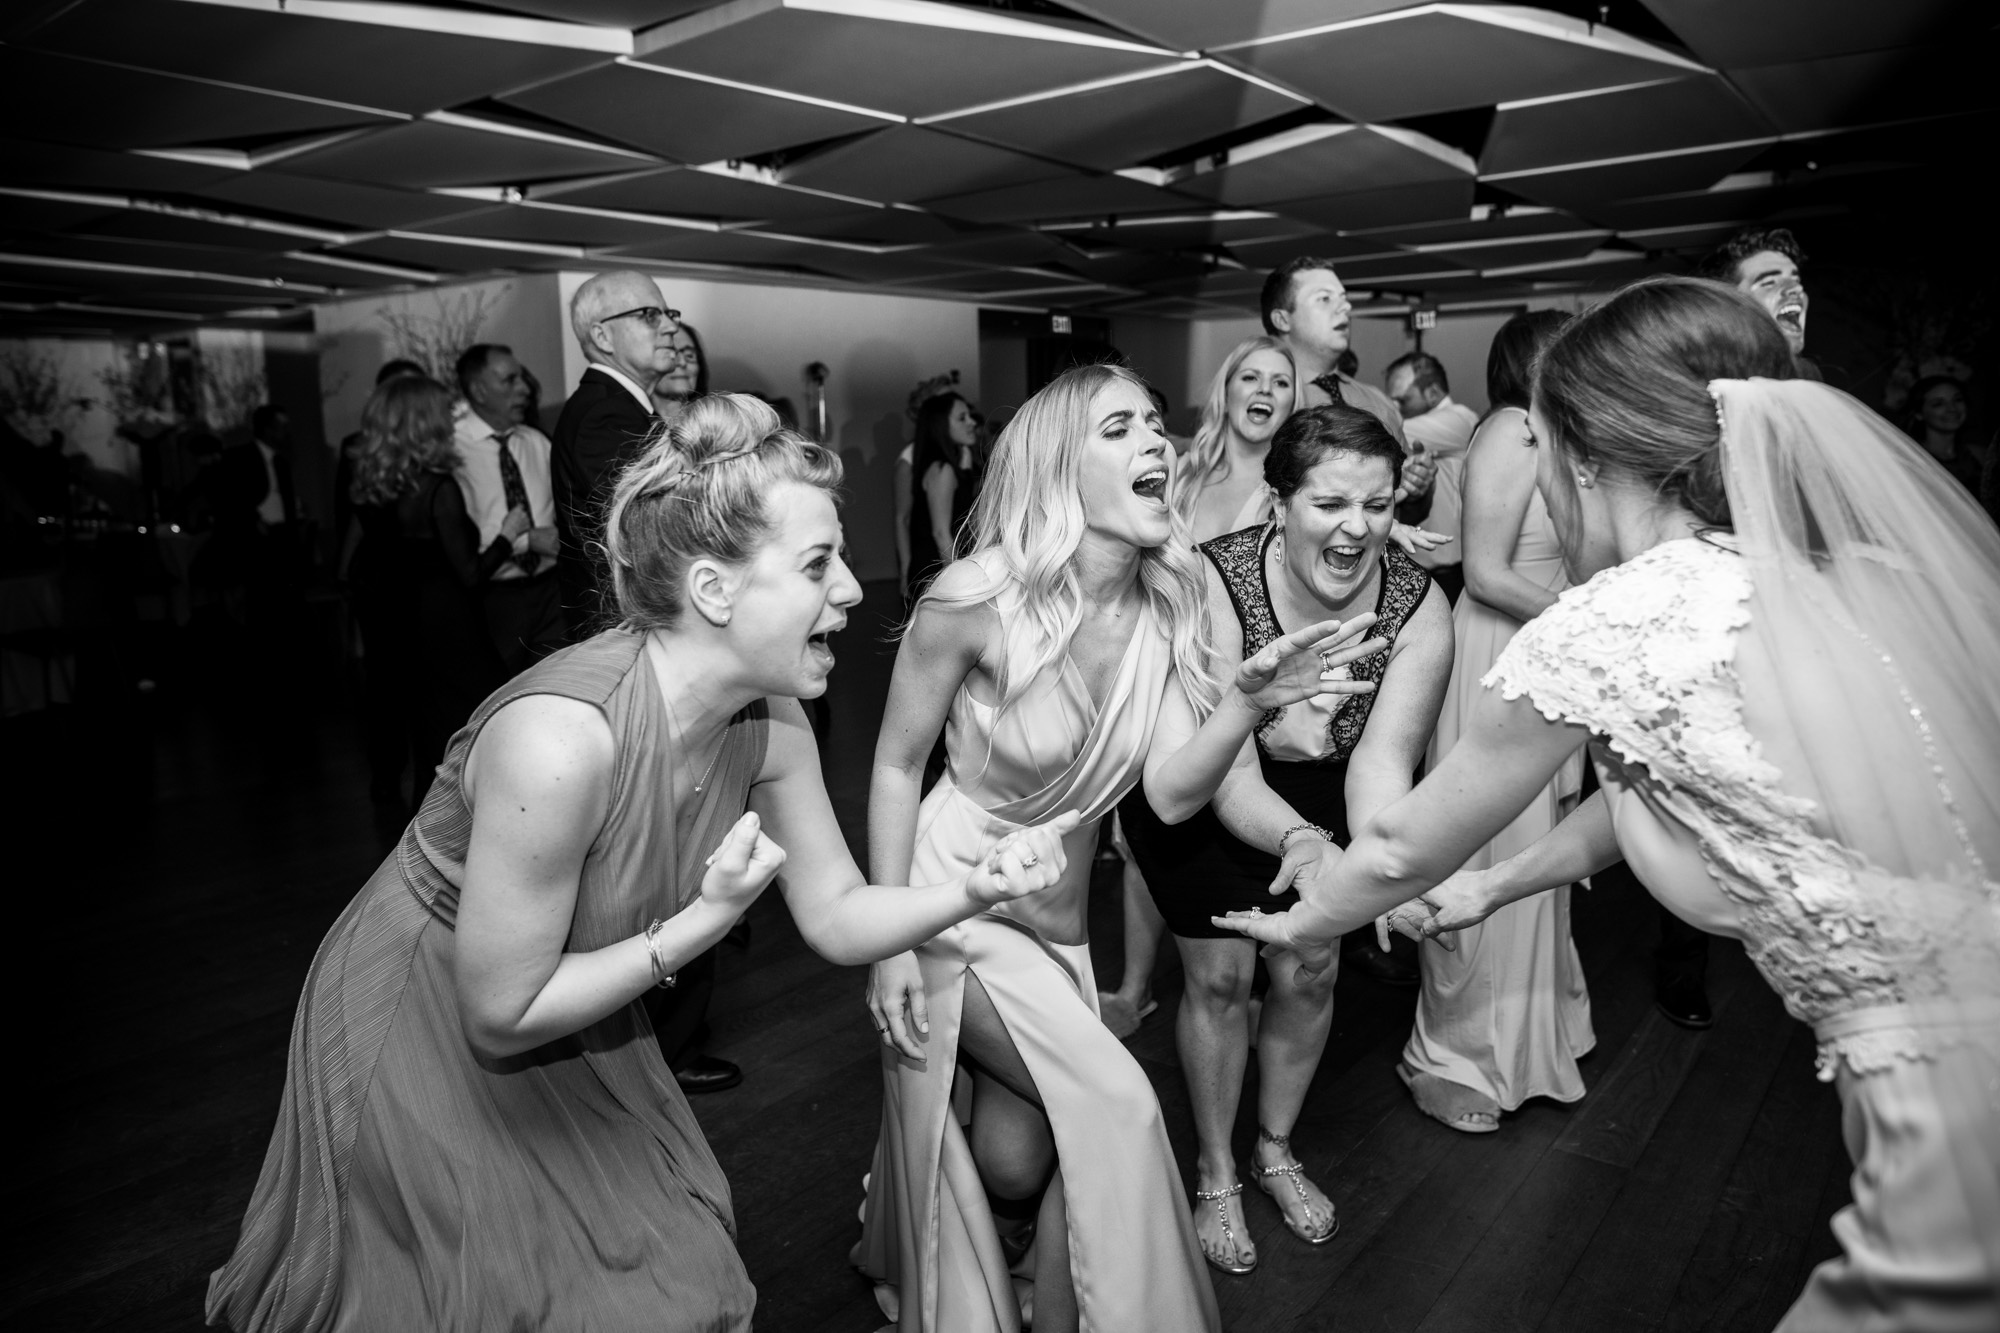 nj-wedding-photographer-maritime-parc-maria-david-55.jpg